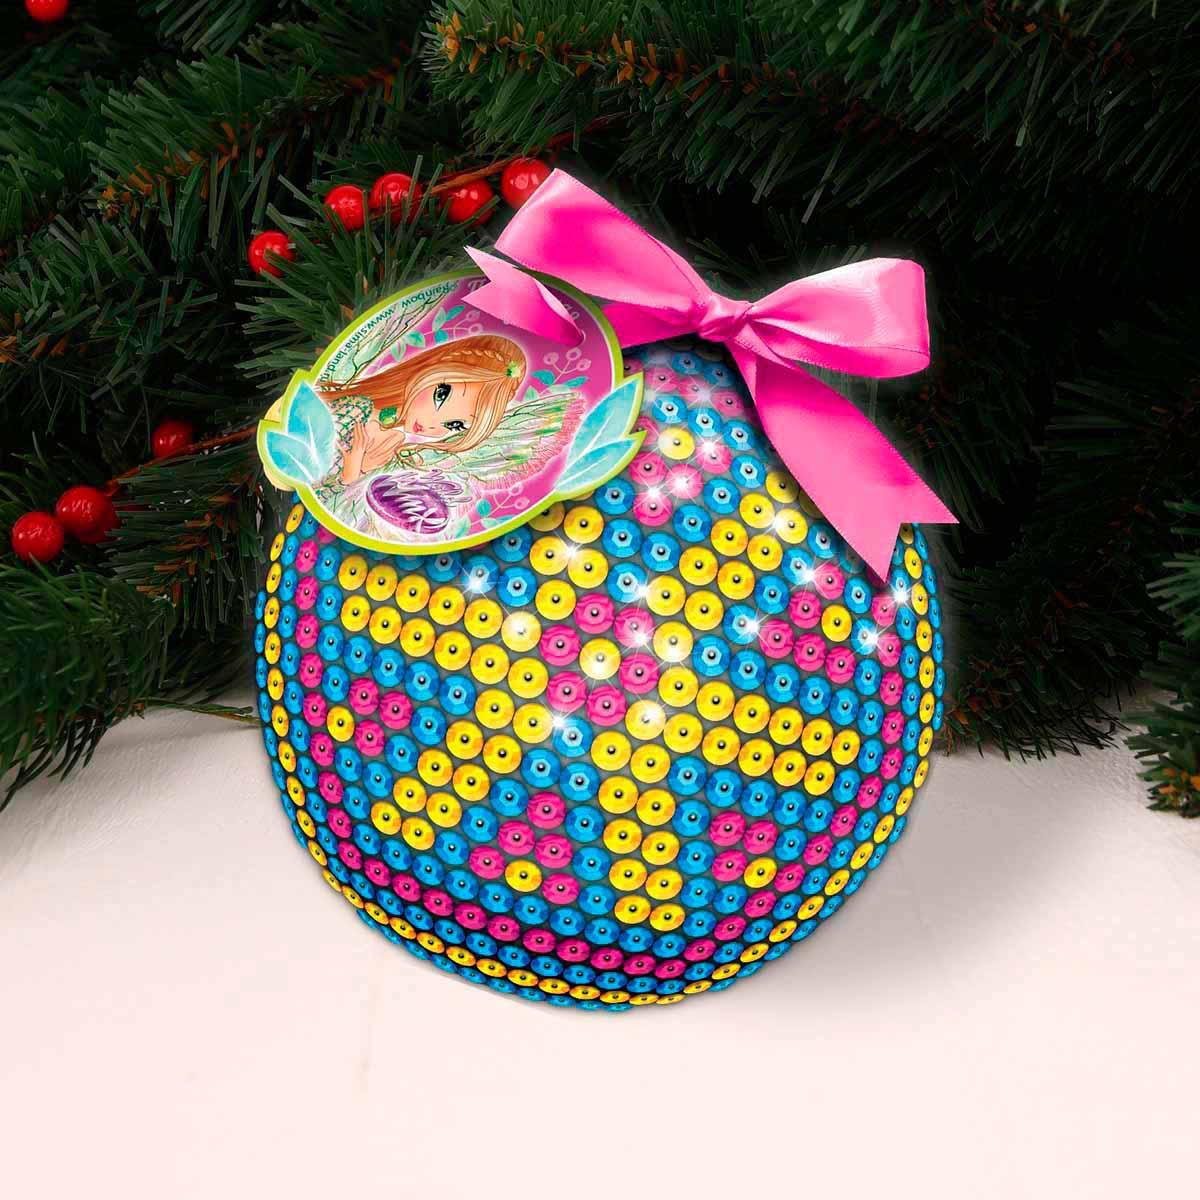 3531285 Новогодний шар 'Прекрасная фея' феи ВИНКС:Флора с пайетками,крепления,лента,мини-открытка